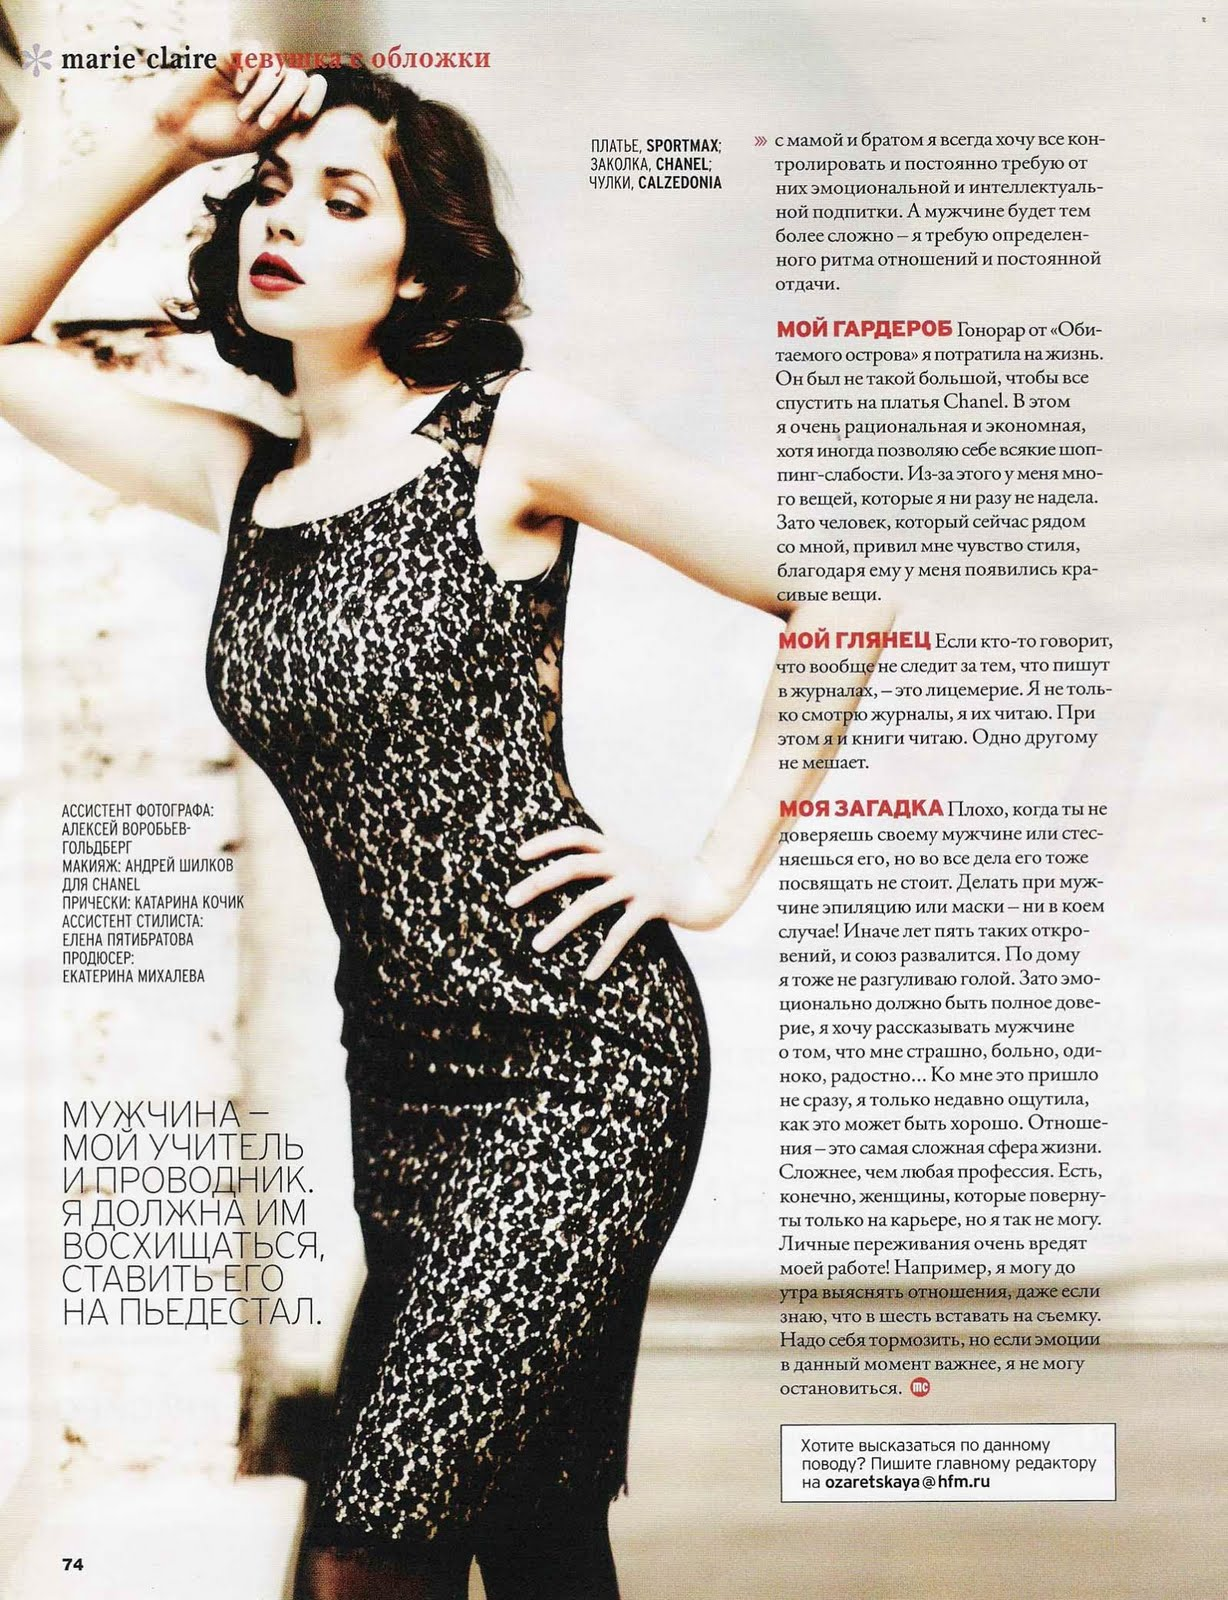 Юлия зимина фото в журнале 20 фотография